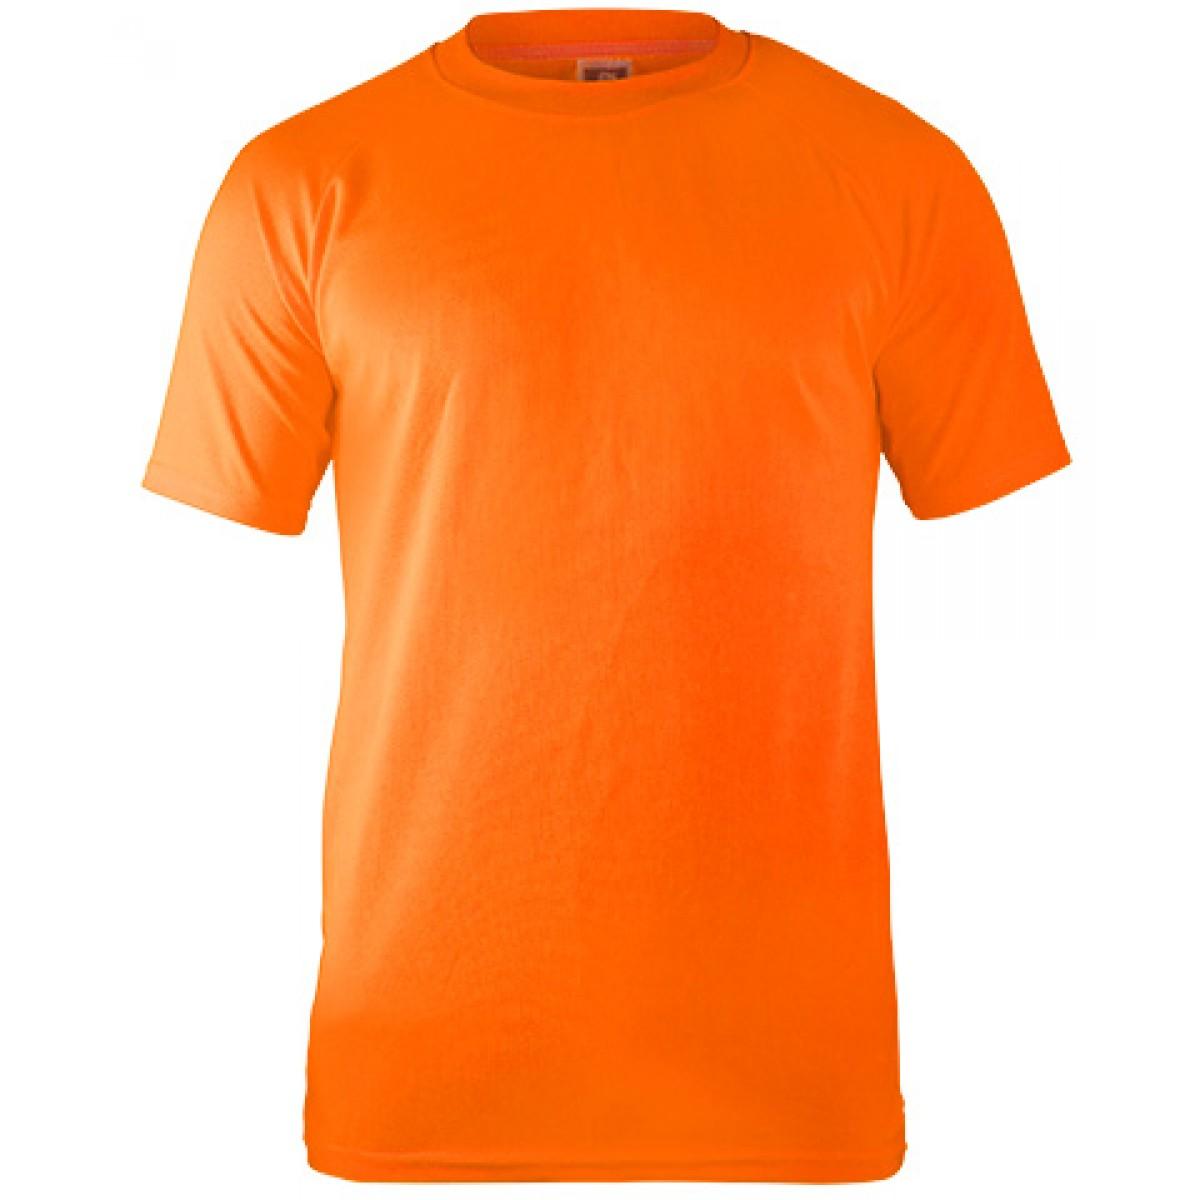 Performance T-shirt-Safety Orange-L